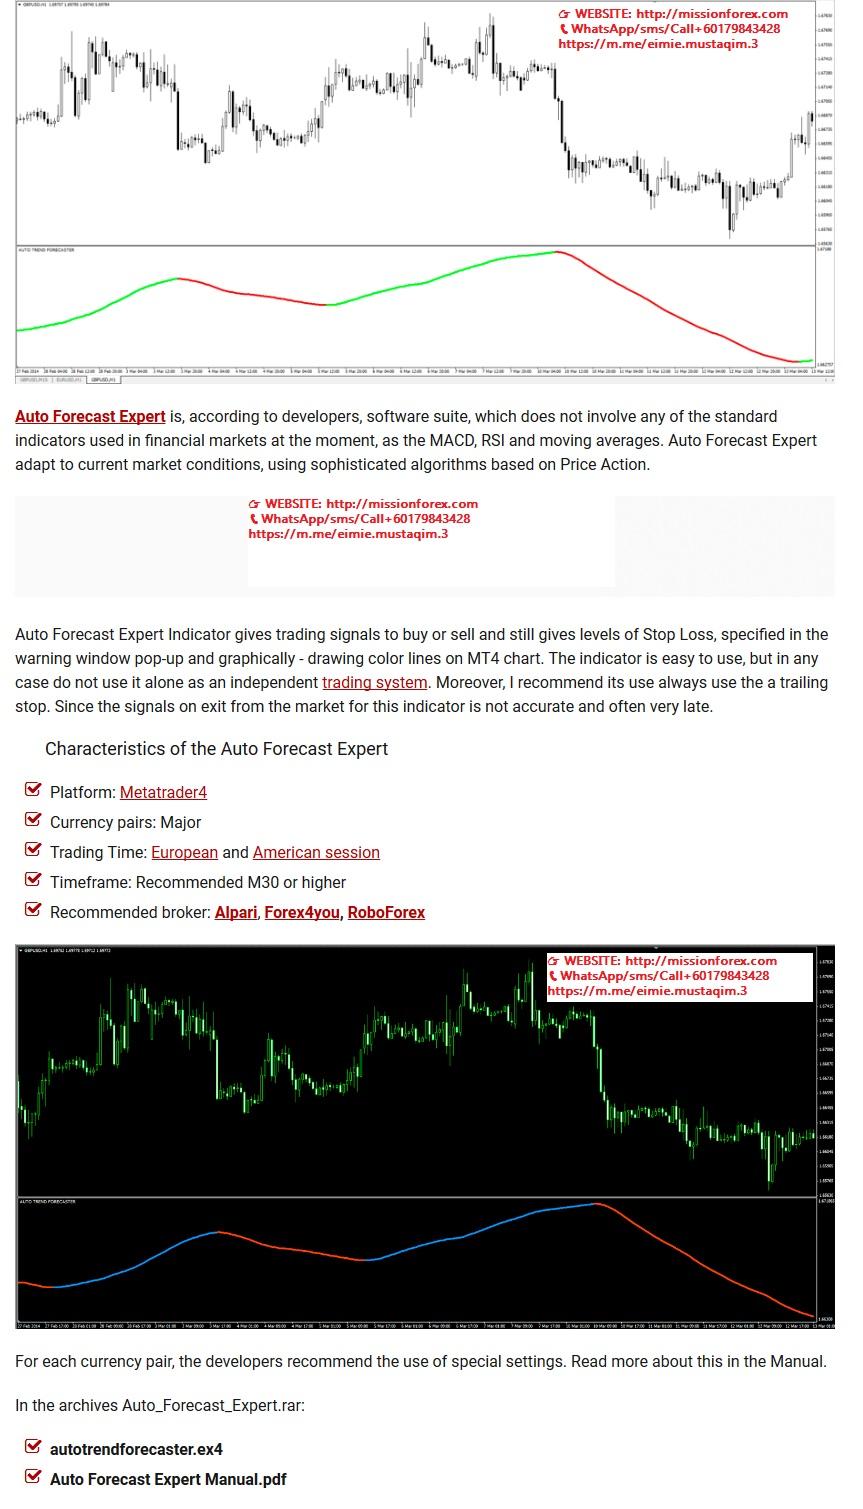 Auto Forecast Expert - A World Class Trading Expert Advisor forex